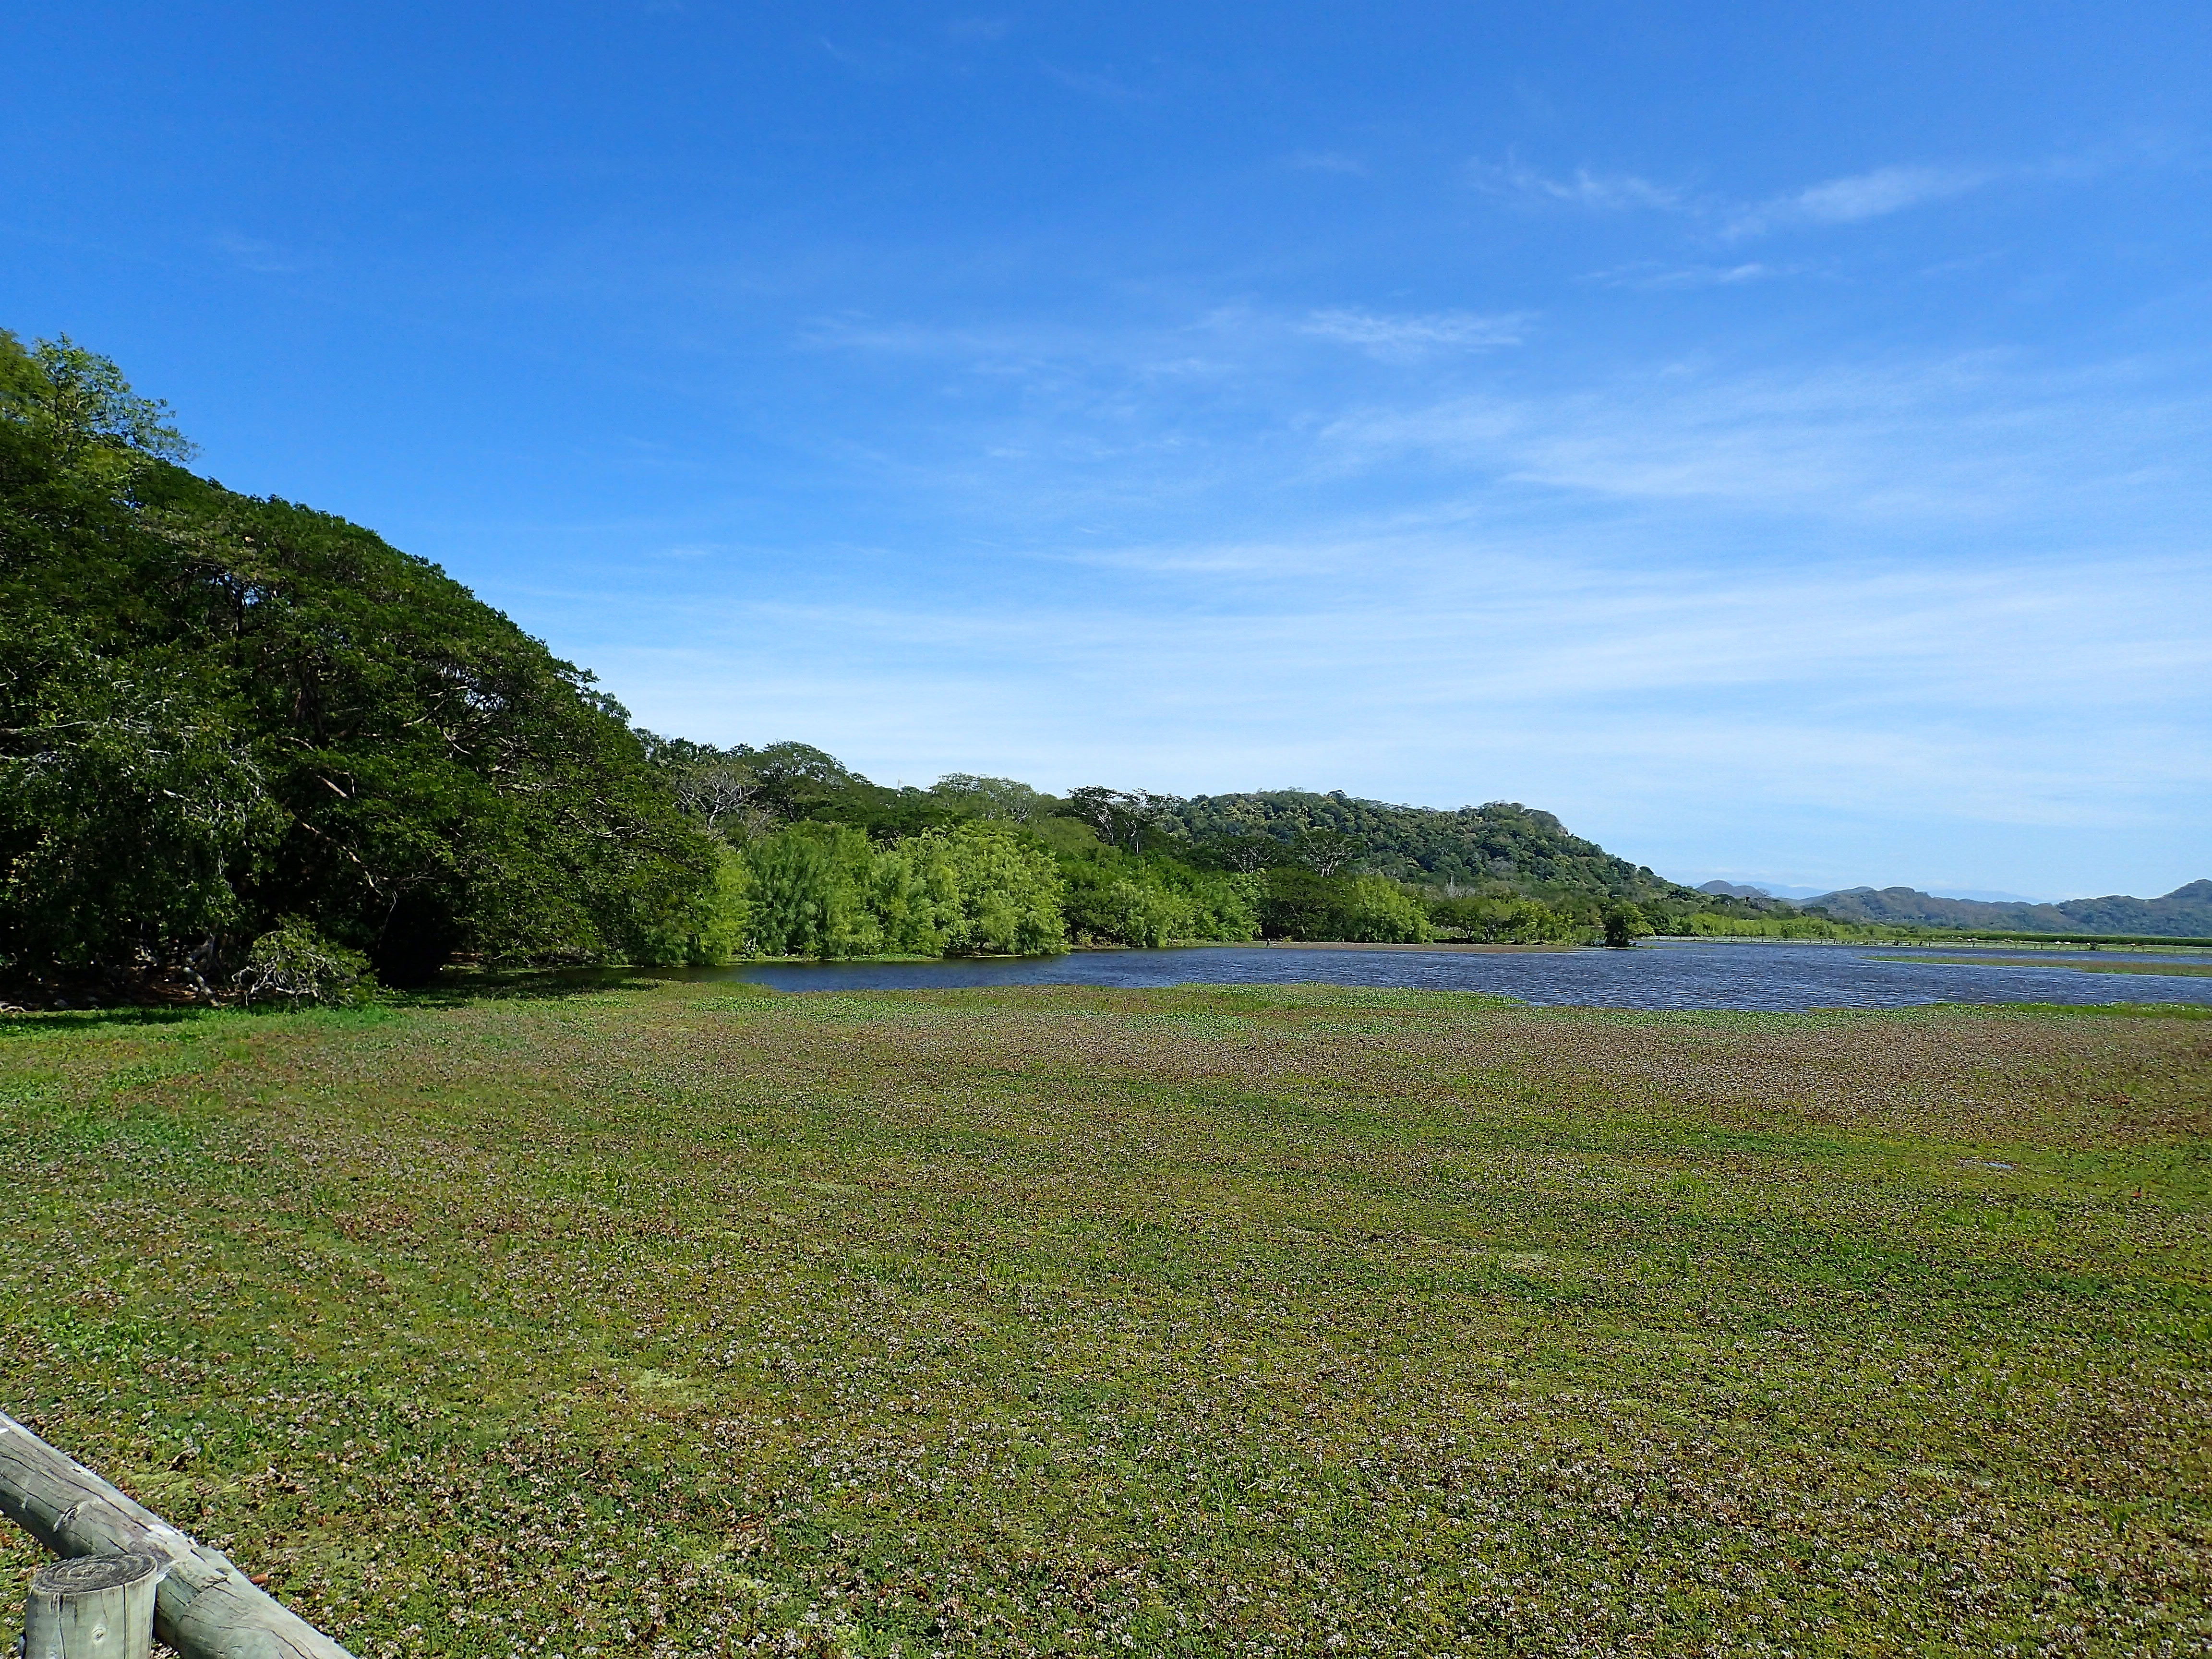 Palo Verde, COSTA RICA. missaventure blog